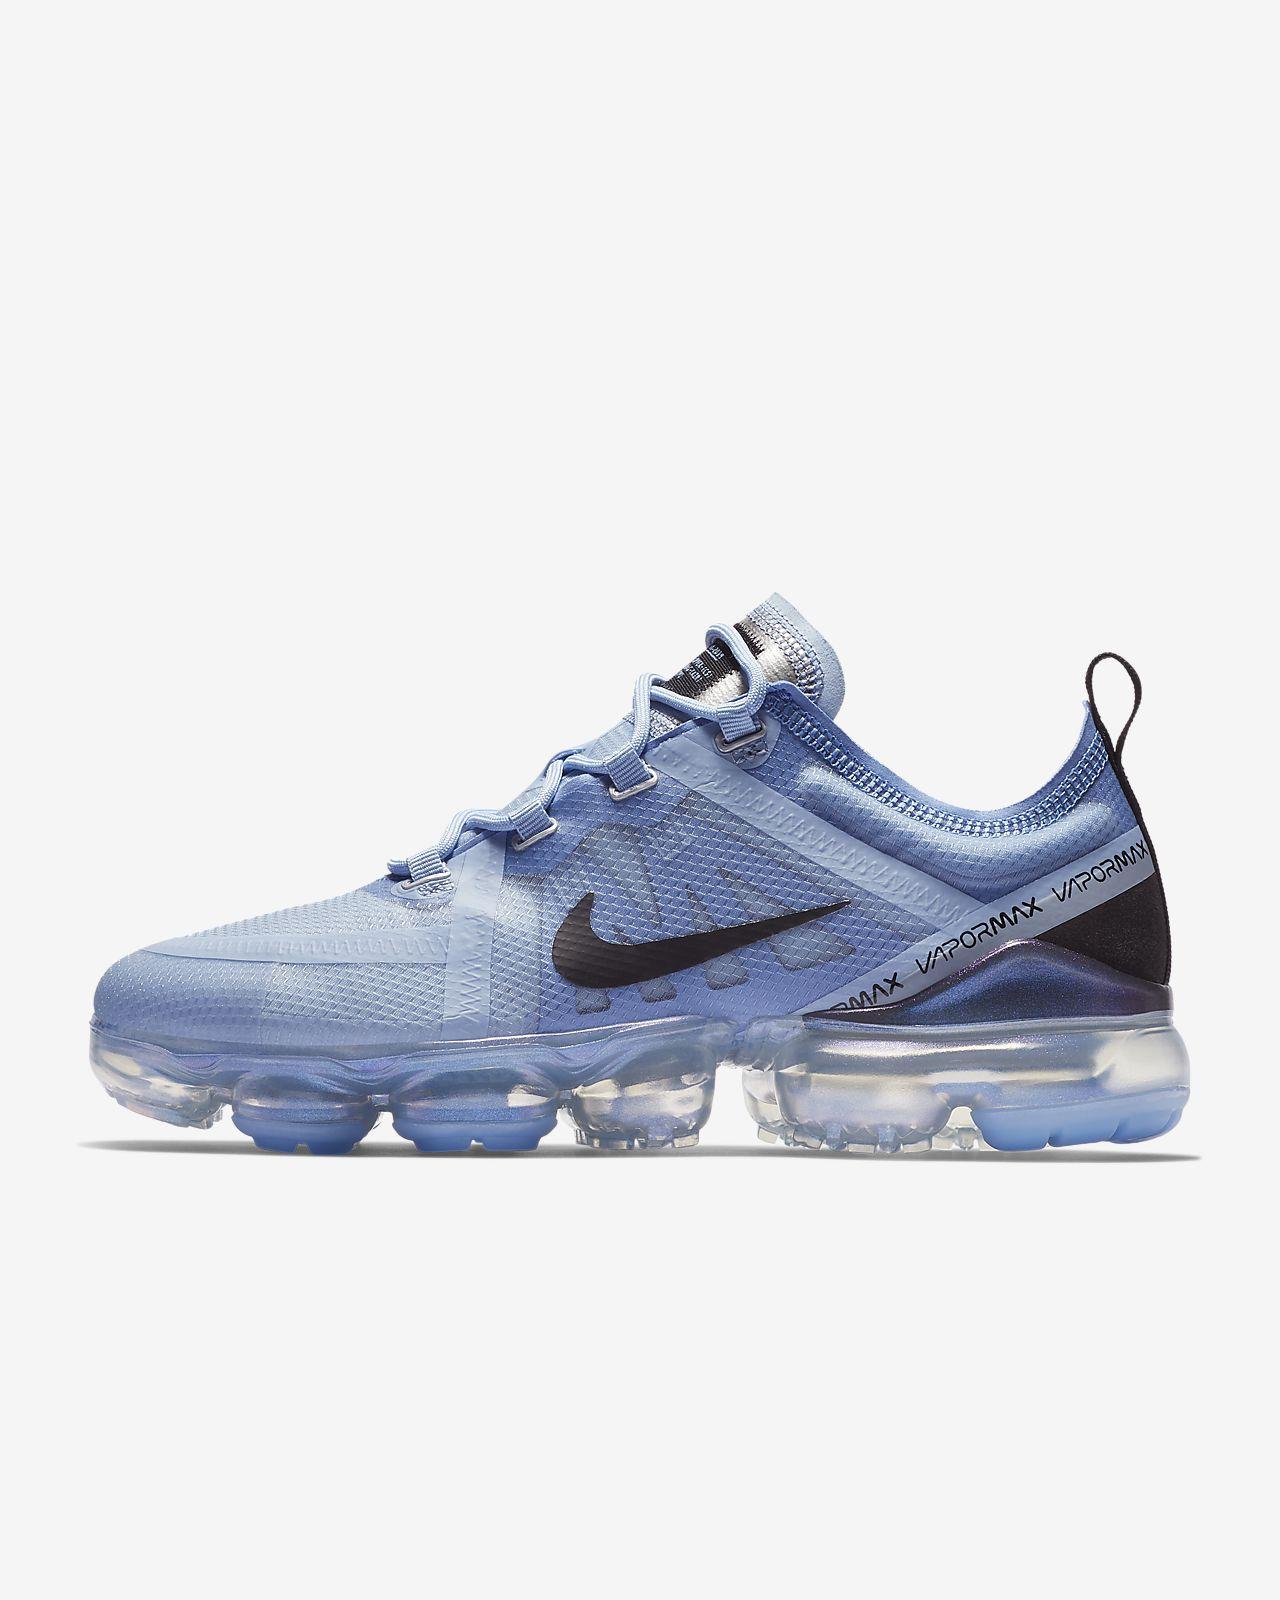 d9be8bb264bccd Chaussure Nike Femme 2019 Air Ca Vapormax Pour 1vwC61